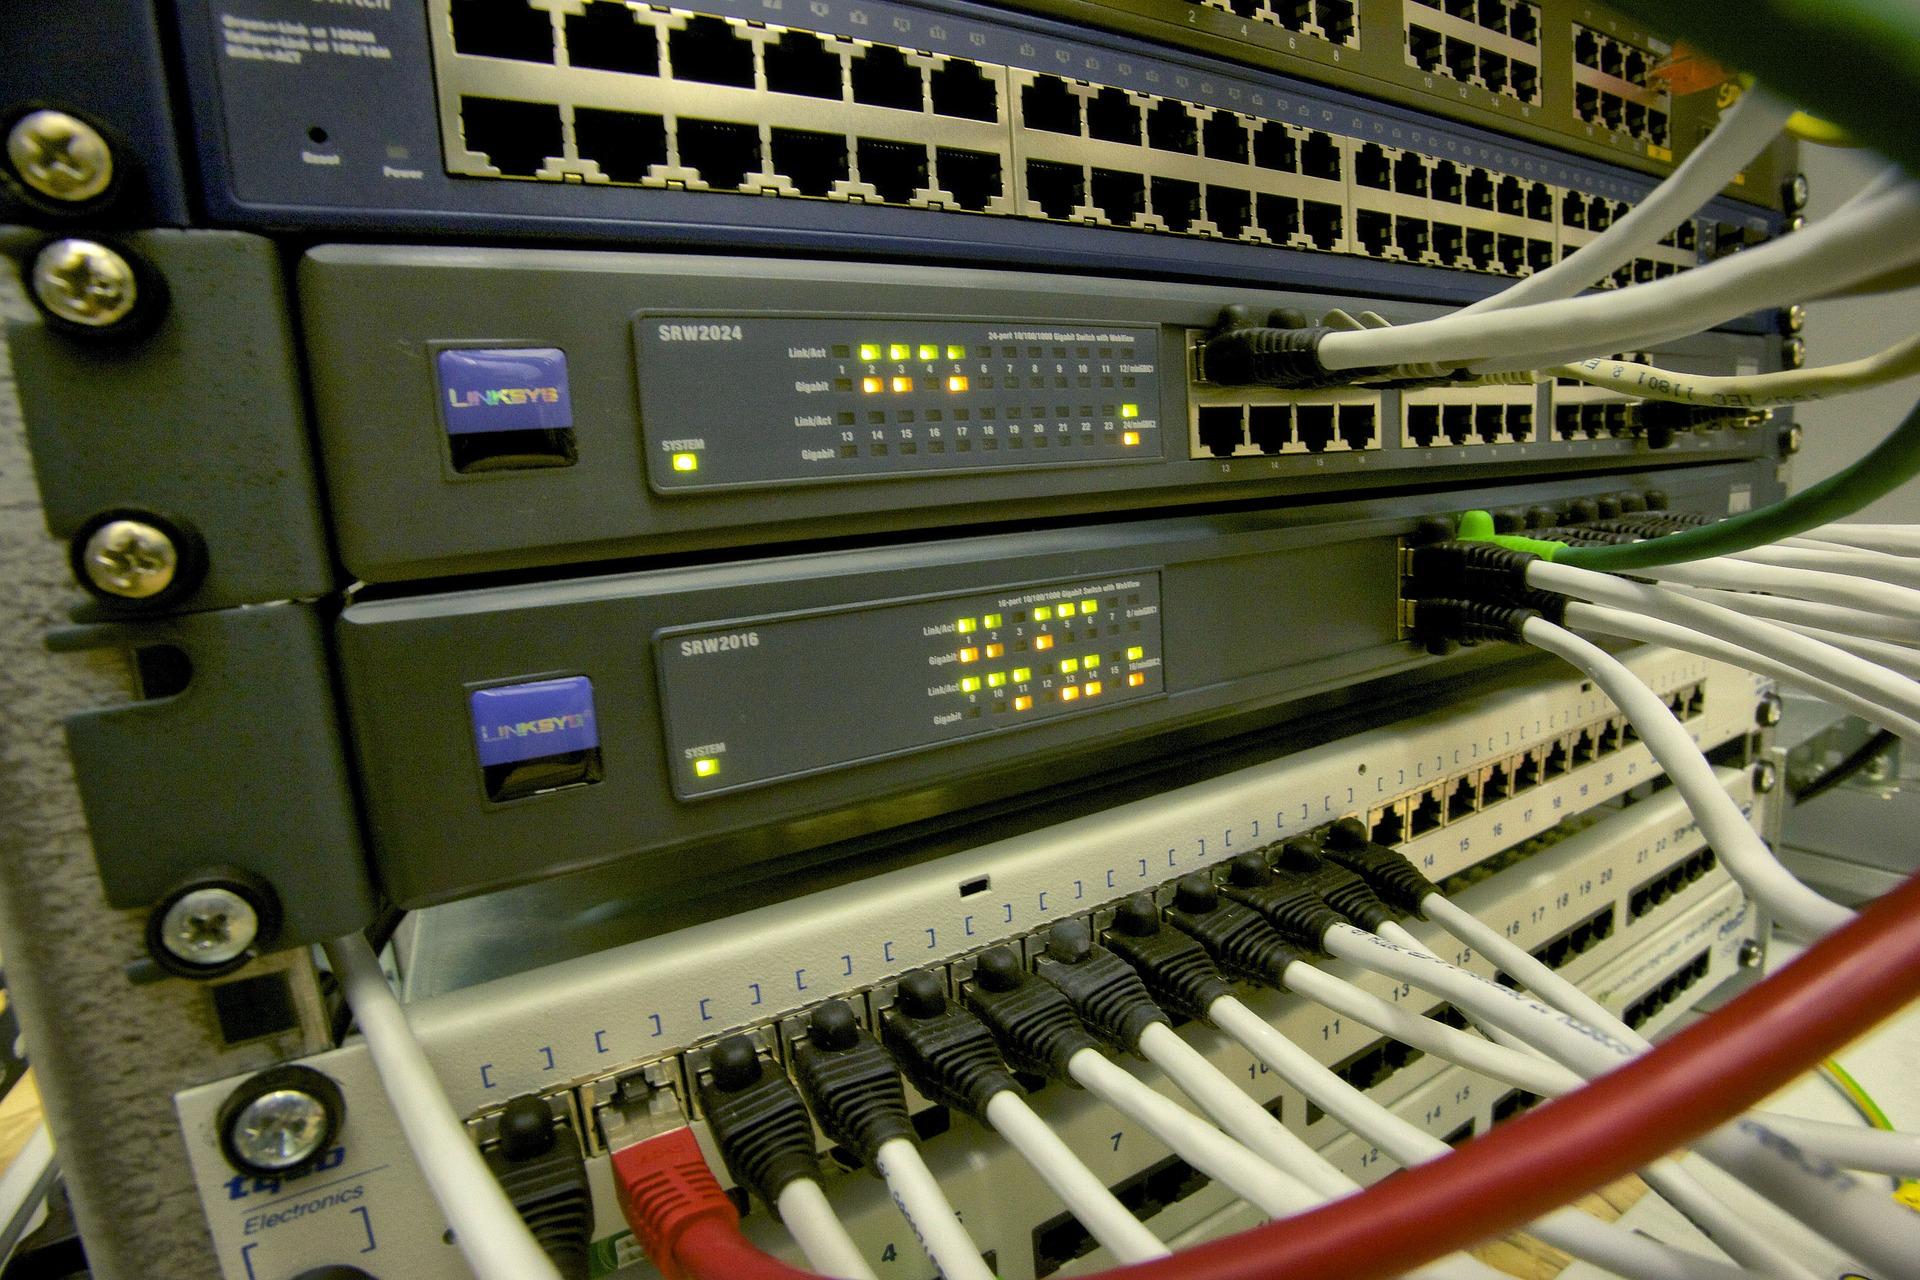 How To Configure Vlan Subinterfaces On Cisco Asa 5500 Firewall Intervlan Routing Layer 3 Switches